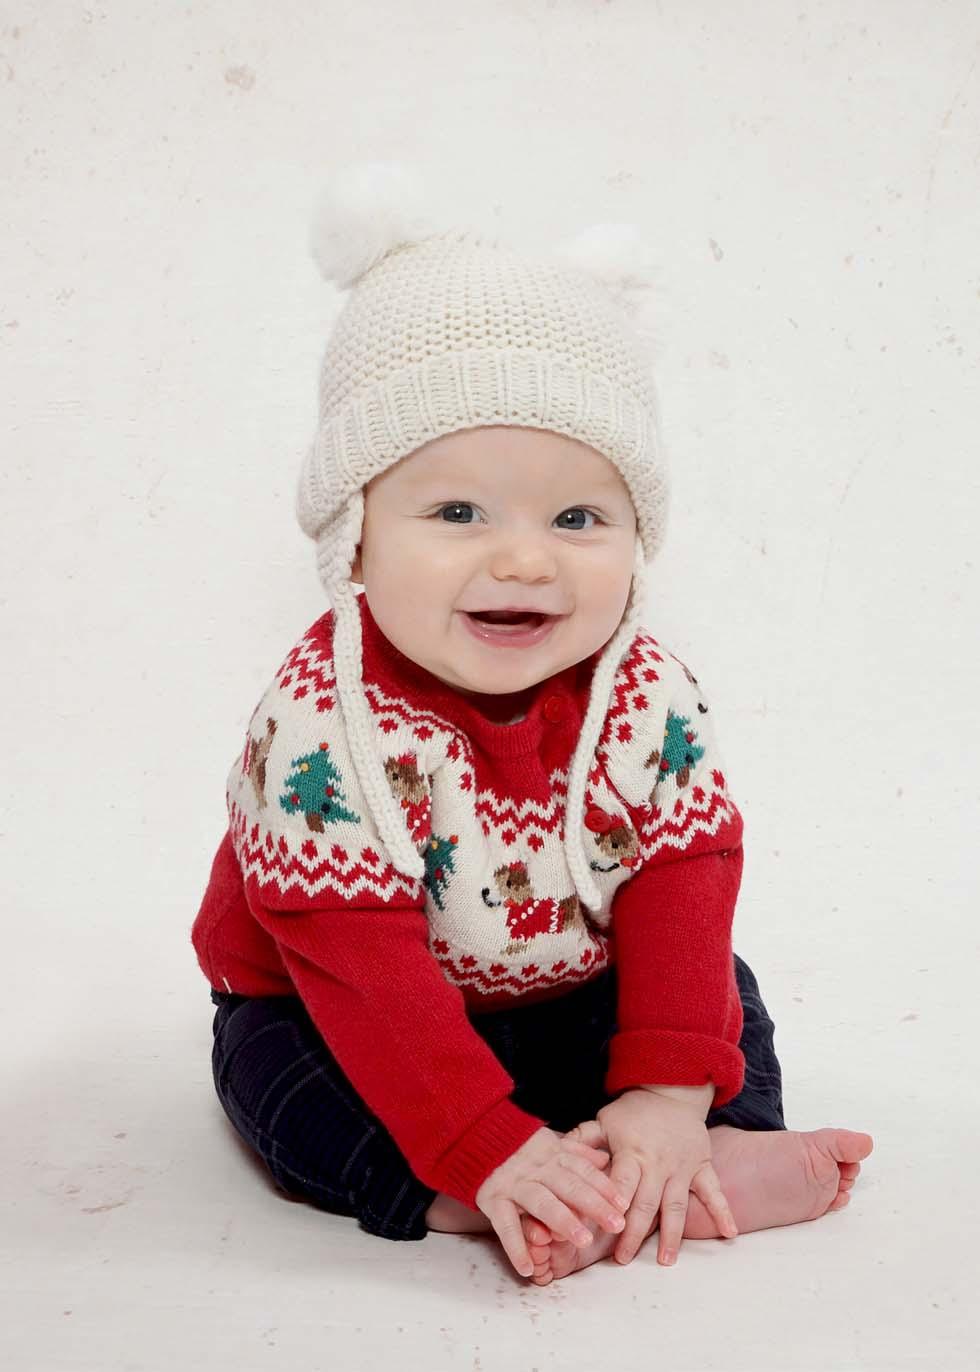 Baby photos, baby photographer, baby boy, family photographer